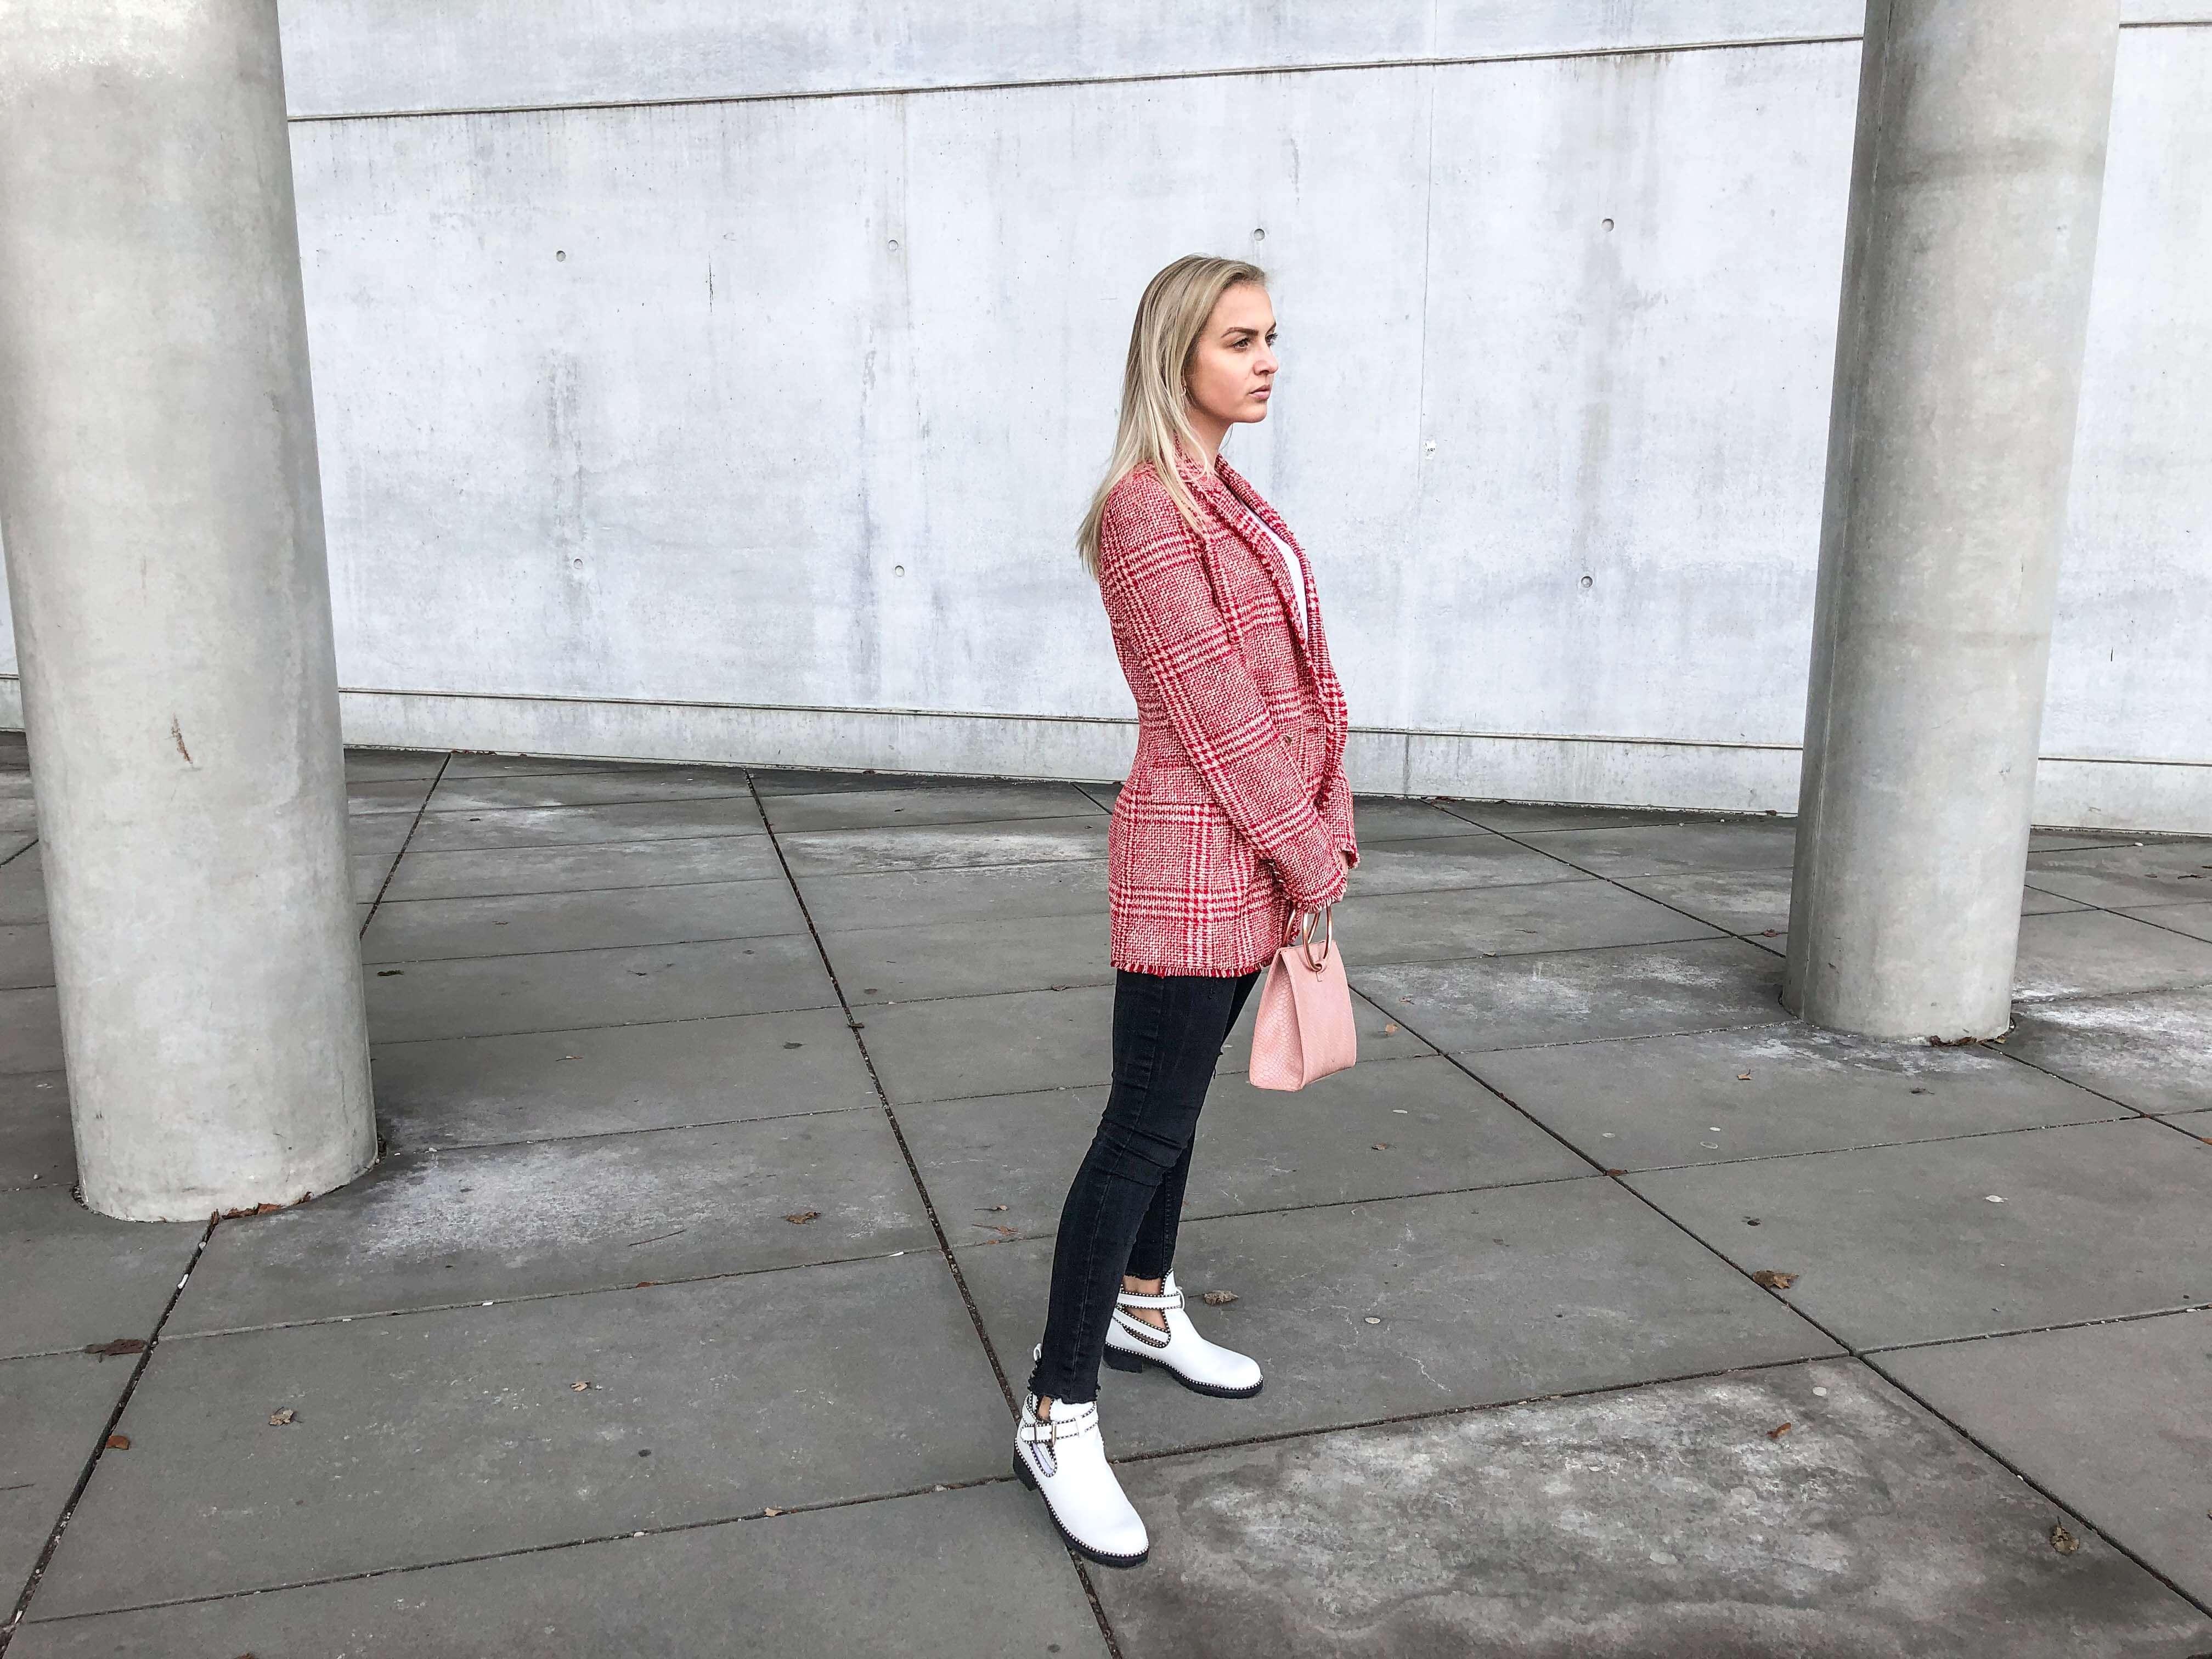 Statement Blazer, Übergangsjacke, Jacke, Glencheck, Katefully, Fashionblog, Modeblog, München, rosa Handtasche, destroyed Jeans